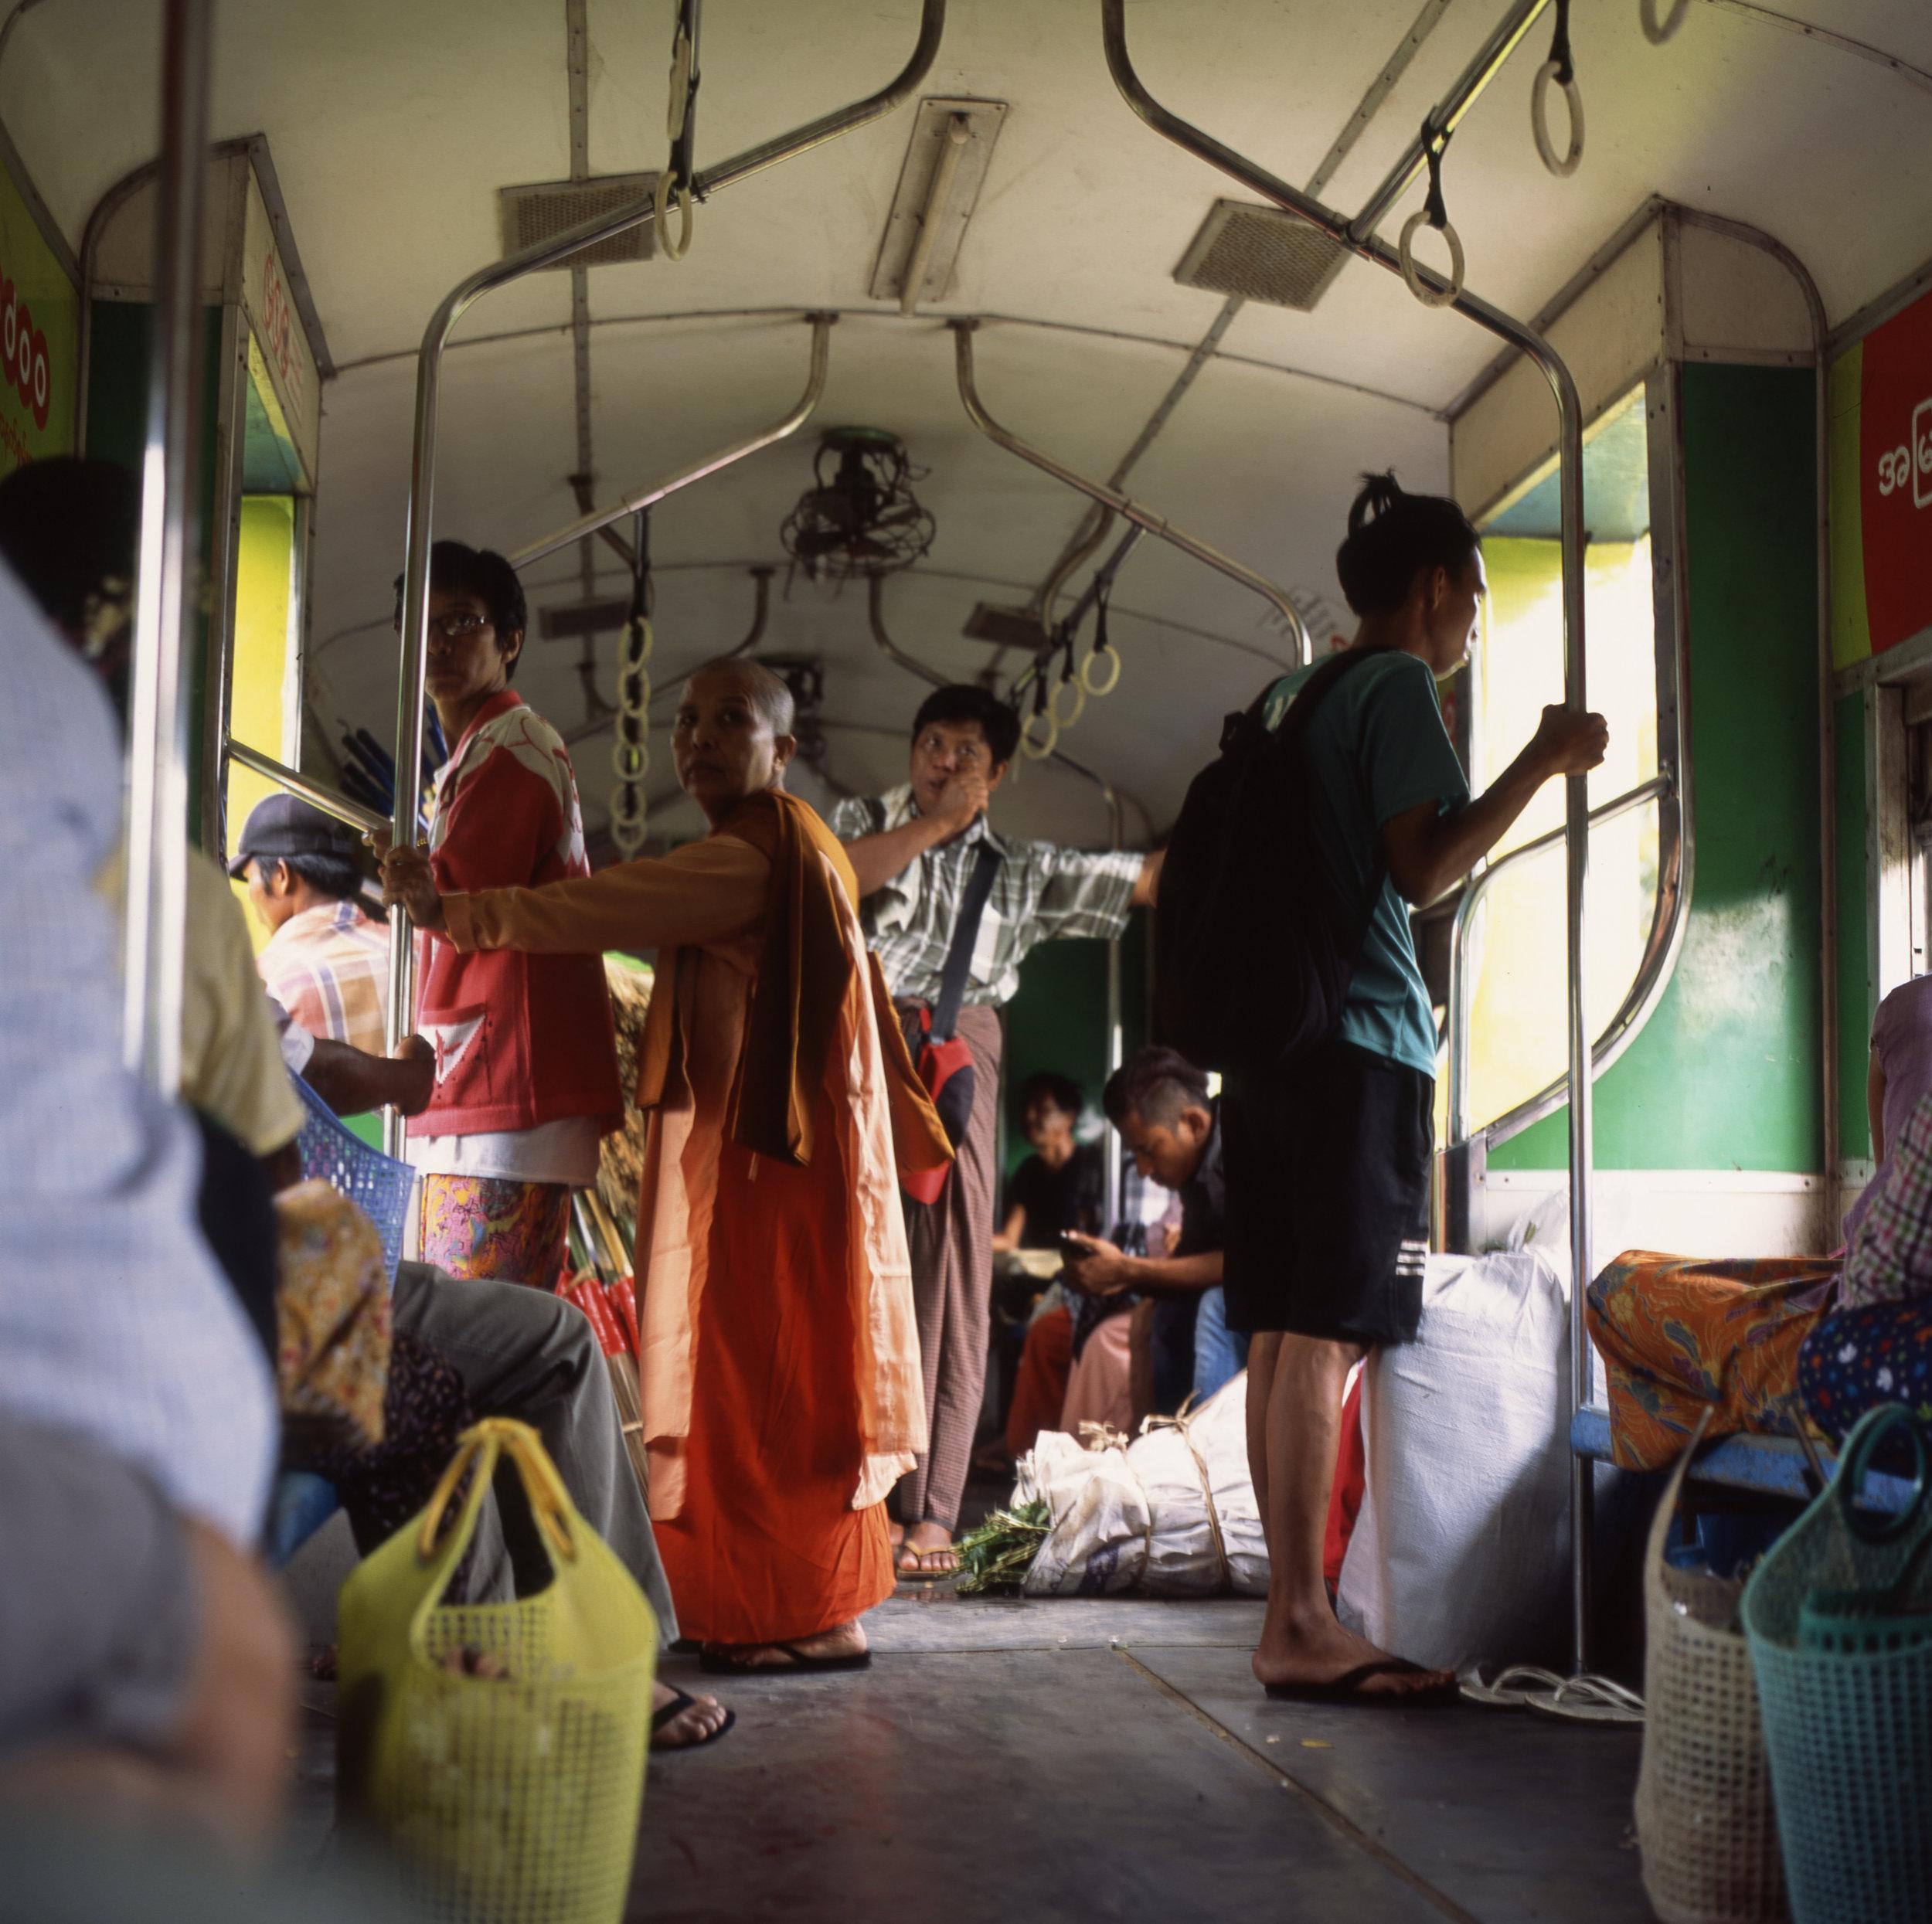 Yangon Circle Line Train Hasselblad 501cm | Fuji Provia 100f